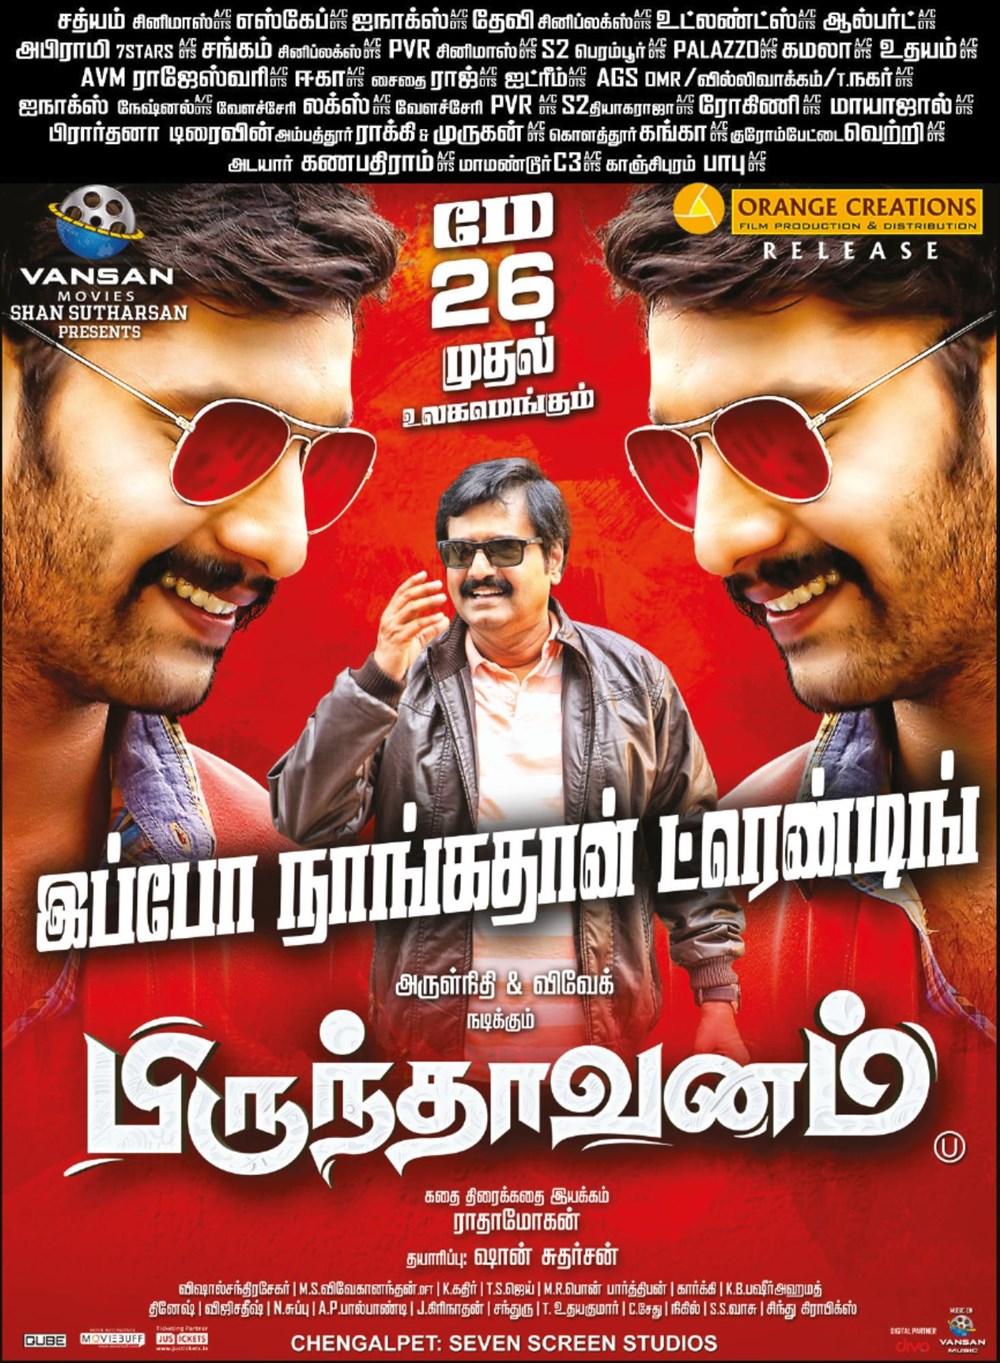 Arulnithi, Vivek in Brindavanam Movie Release Posters